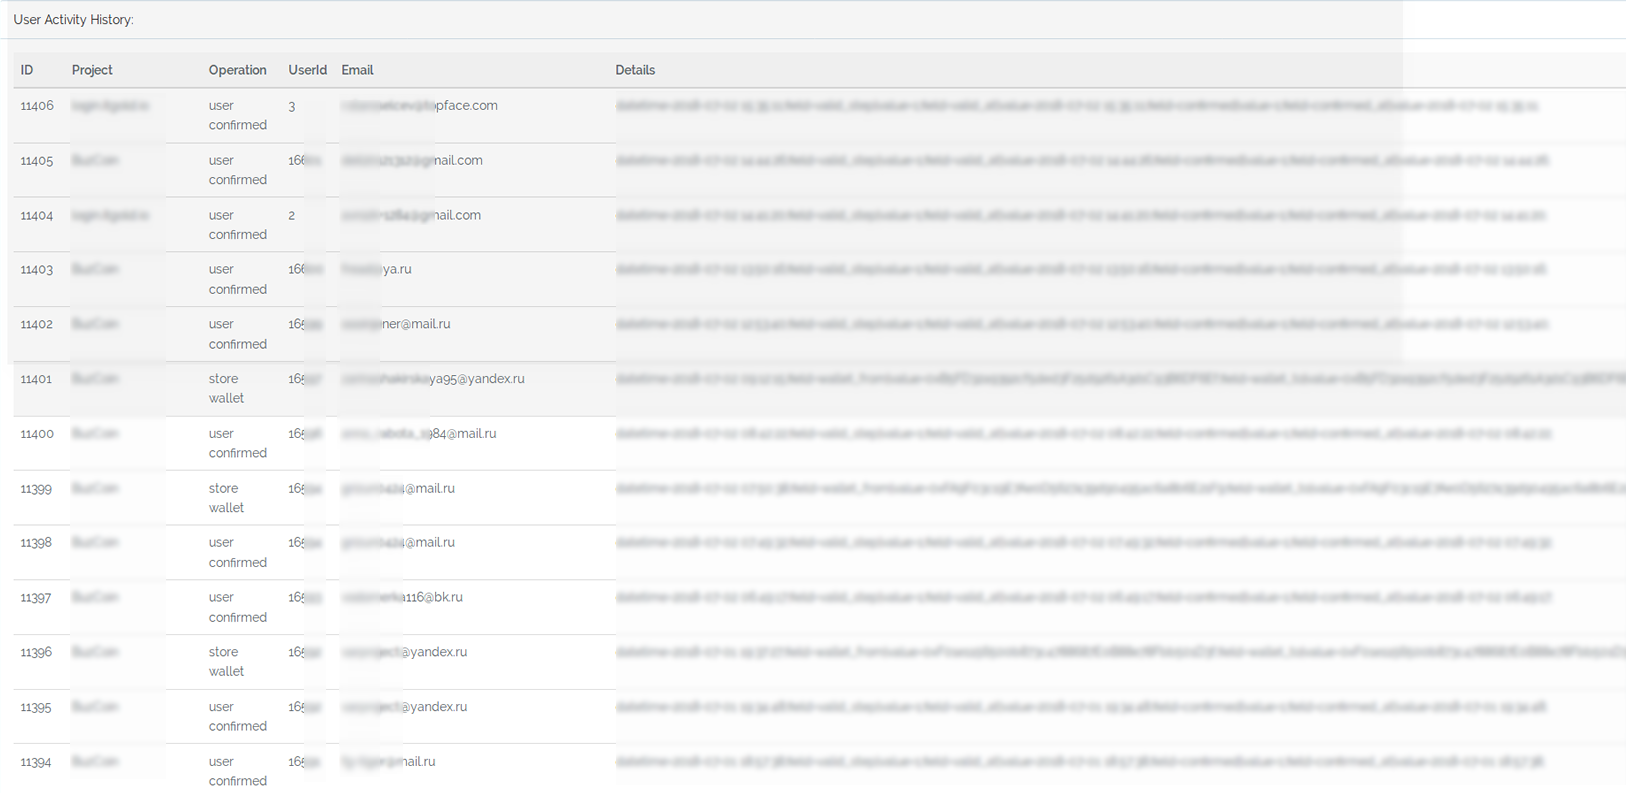 img 5b3f8804a3d63 - Admin panel screenshots